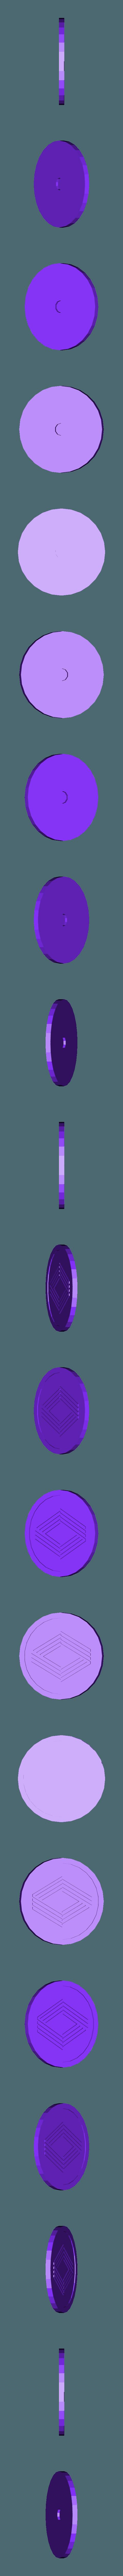 Moyen BBS Renault partie haute.stl Download STL file Renault BBS hub • Design to 3D print, fanfy54